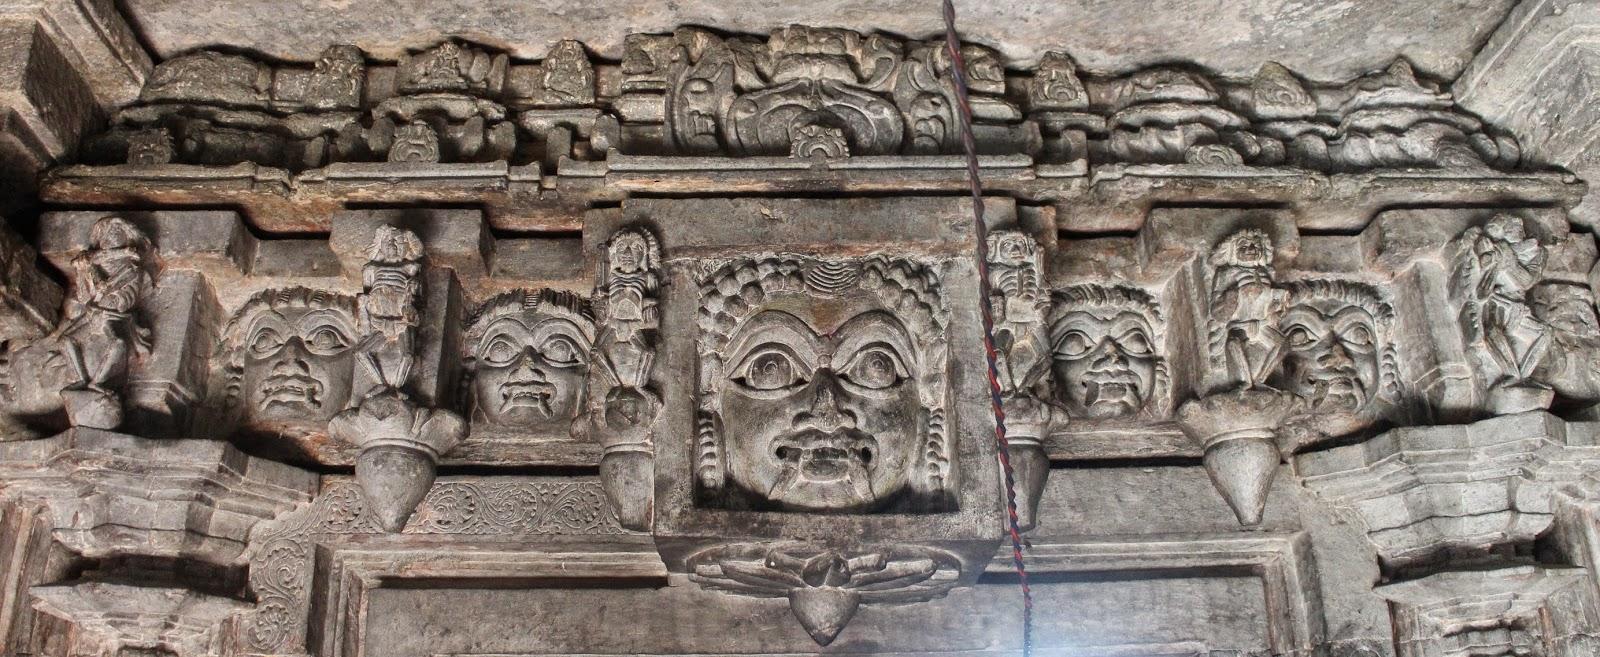 Hoysala Temple, Doddagaddavalli, Hassan, Heritage site, karnataka, Karnataka Tourism